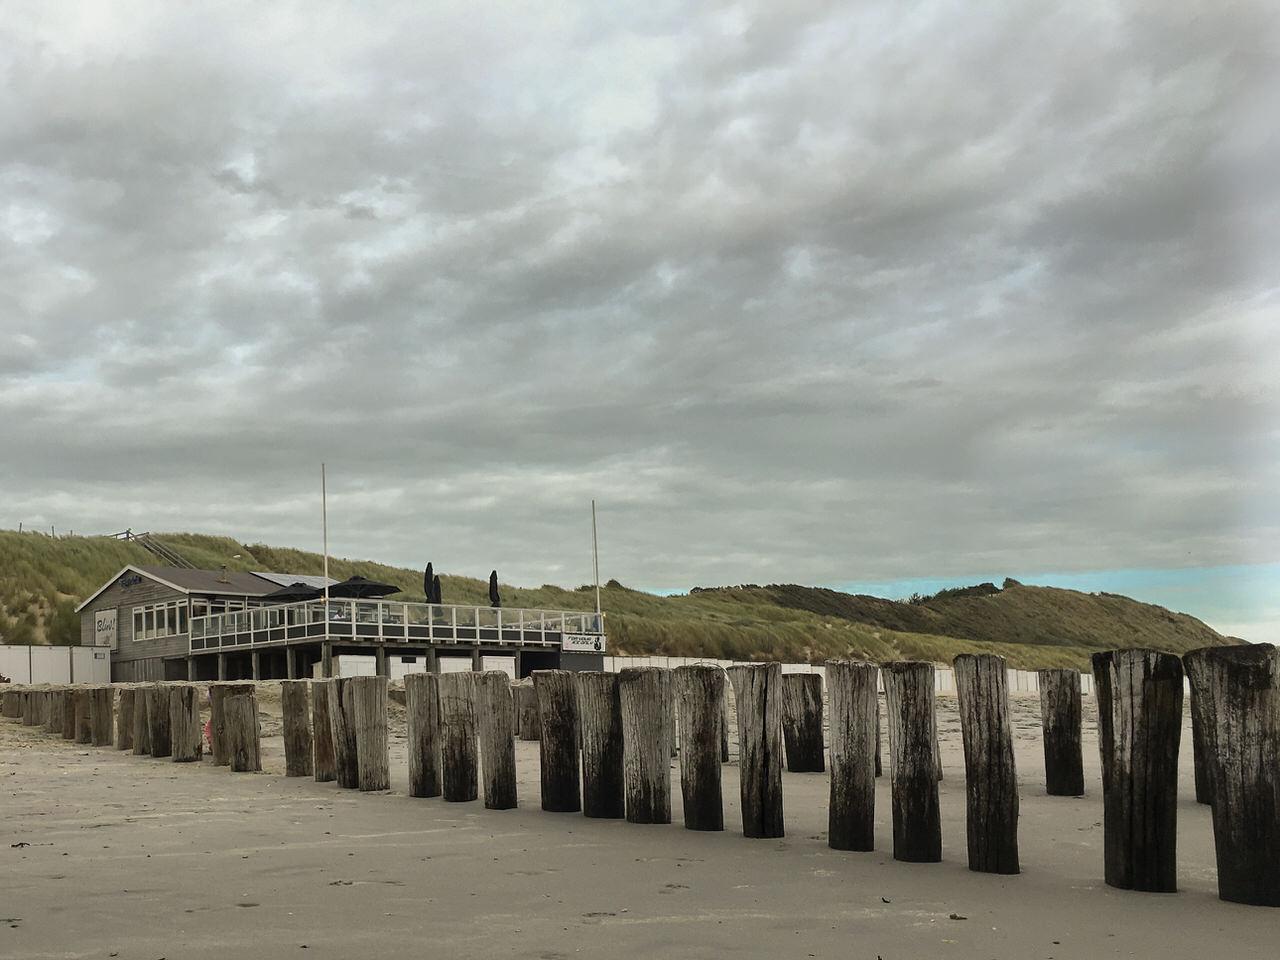 Der Strandpaviljoen Bluv schmiegt sich an die Dünen der holländischen Nordseeküste. Foto: Andreas Paul / Paul van Groove